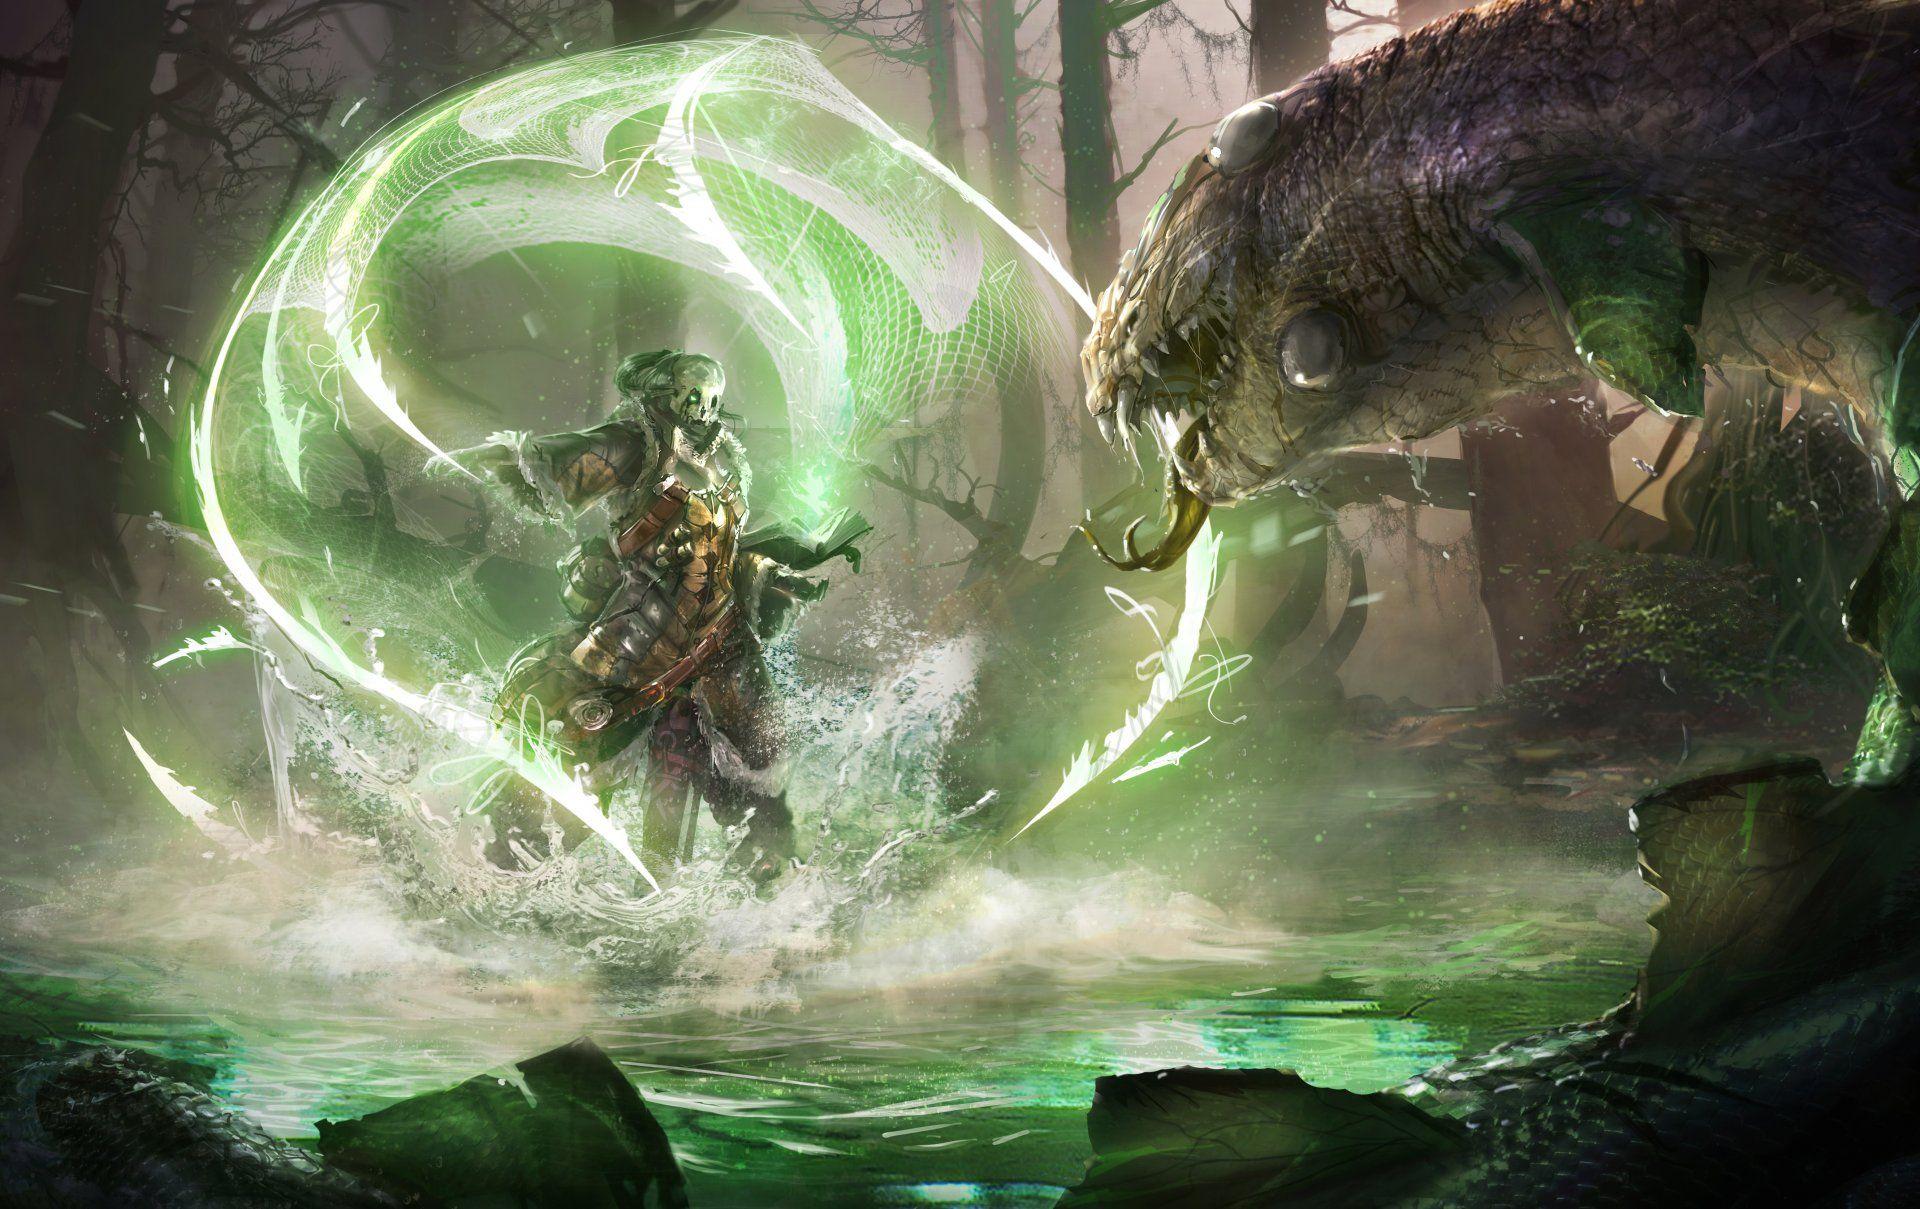 king-of-magie-final-2 | Fantasy wizard, Fantasy ...